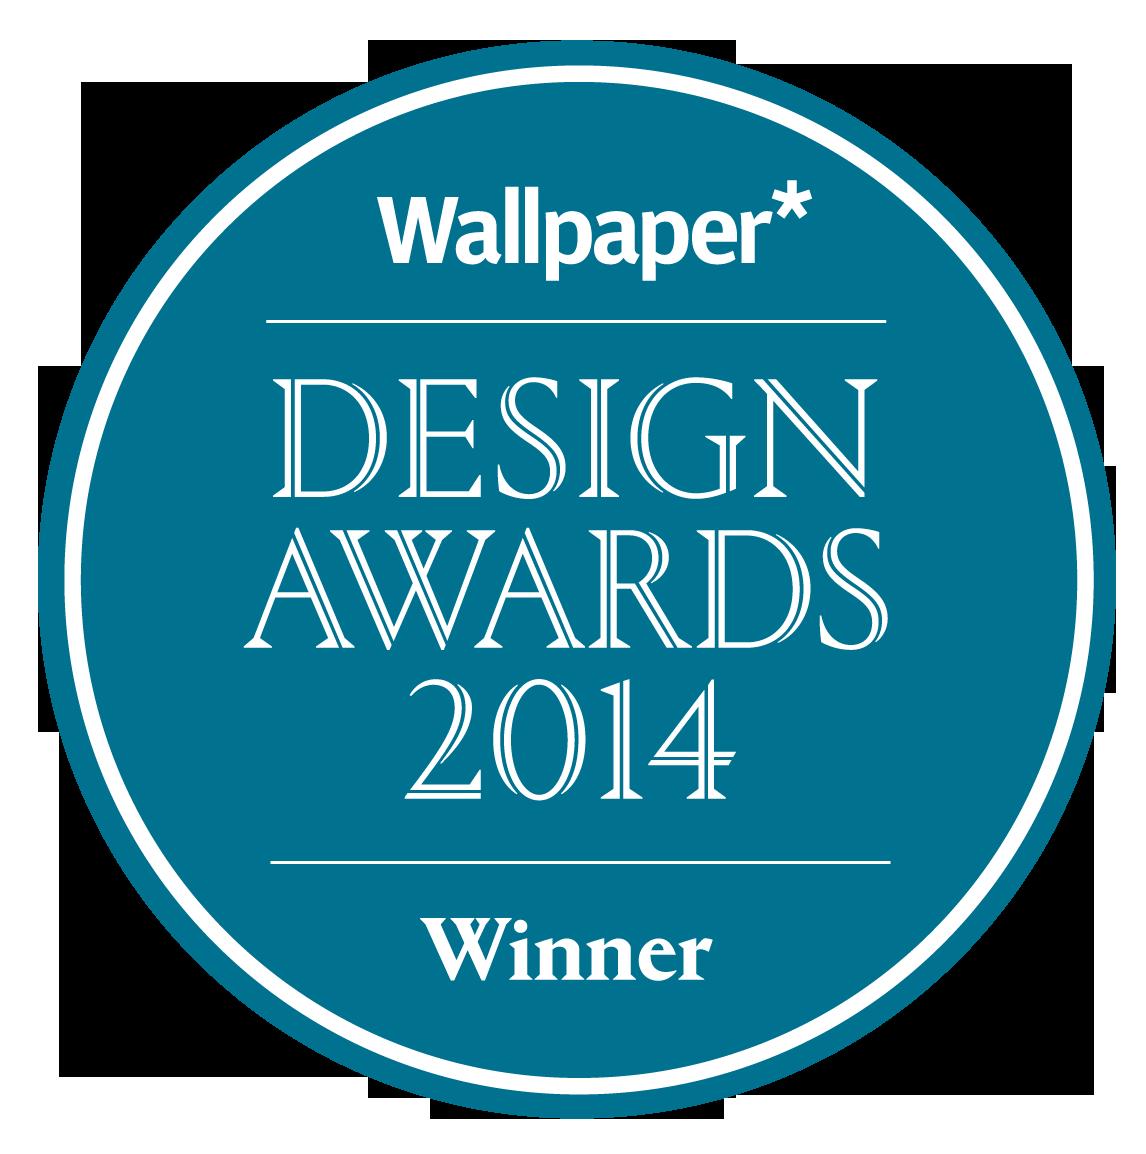 wallpaper design awards 2014png 1146x1154